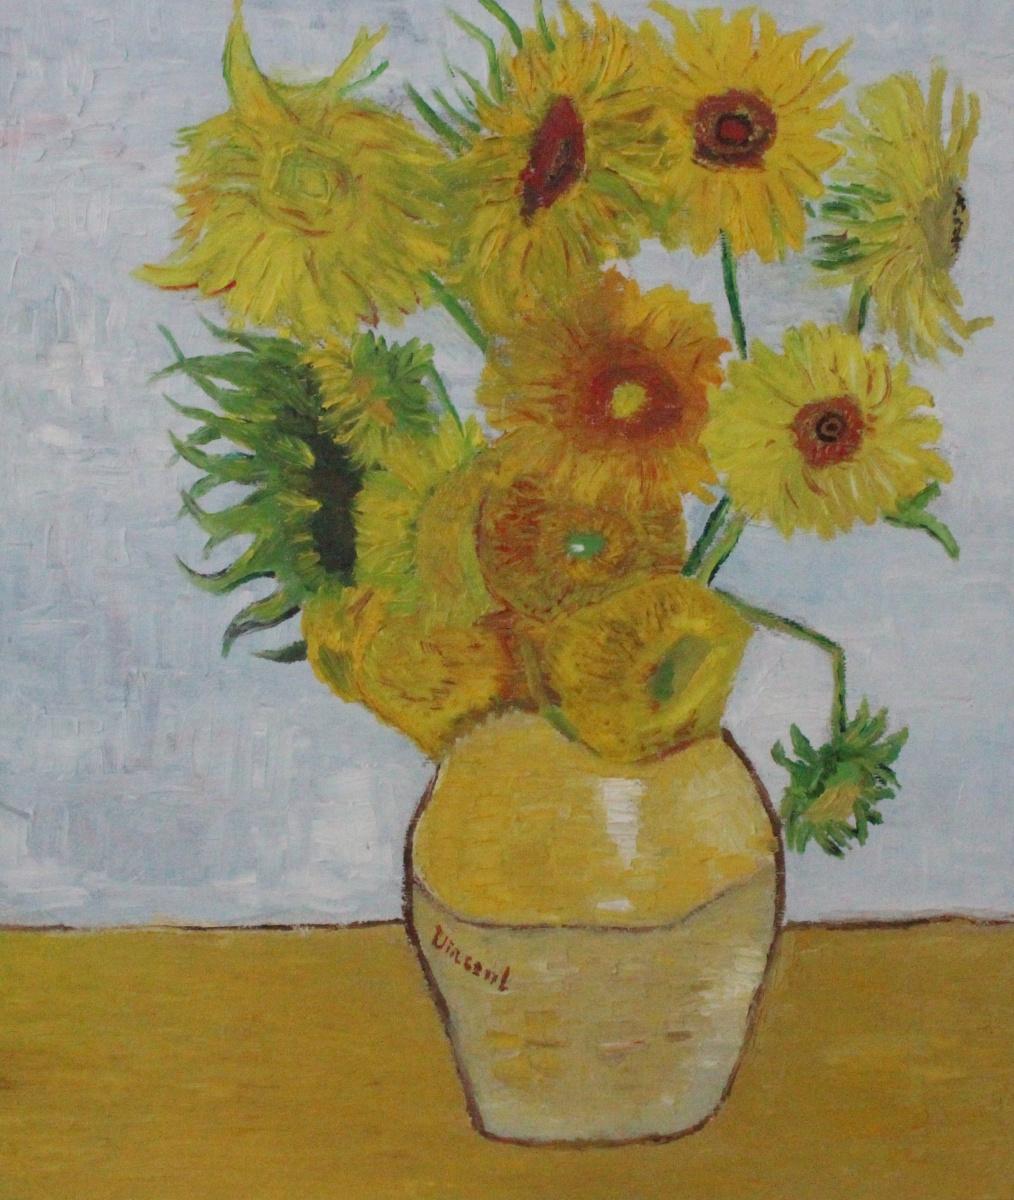 Paul. Sunflowers 1888 Van gogh